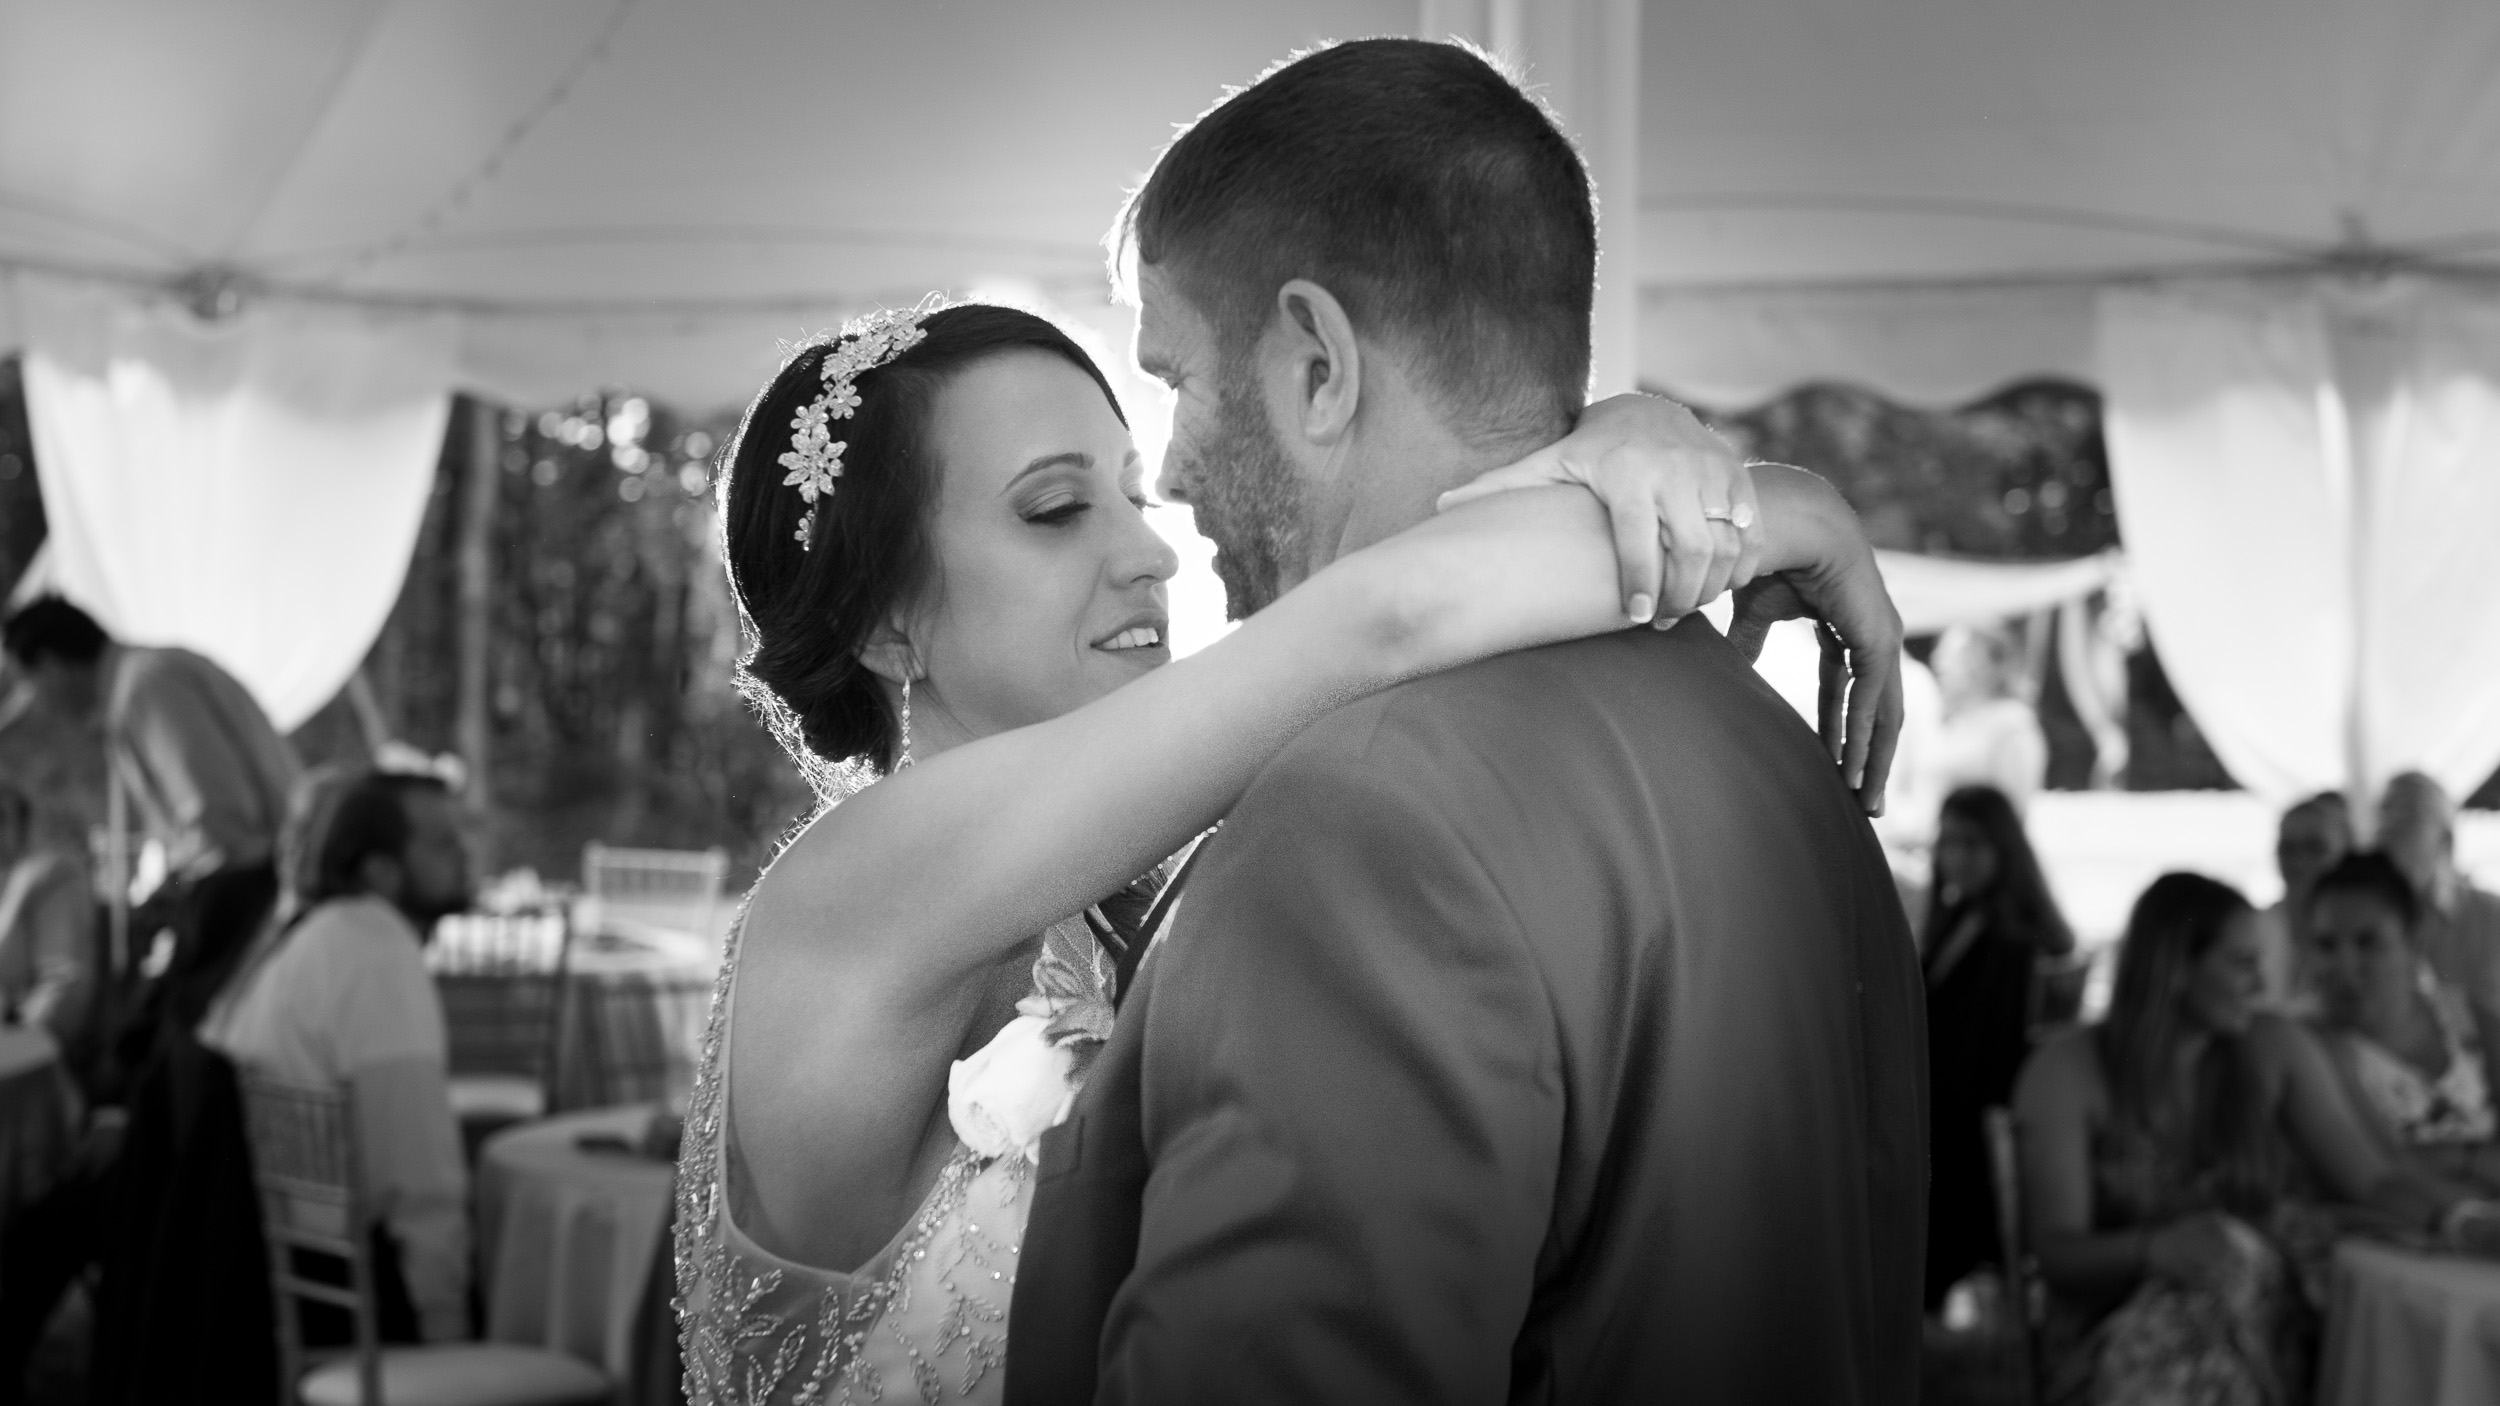 Bride-and-groom-first-dance.jpg